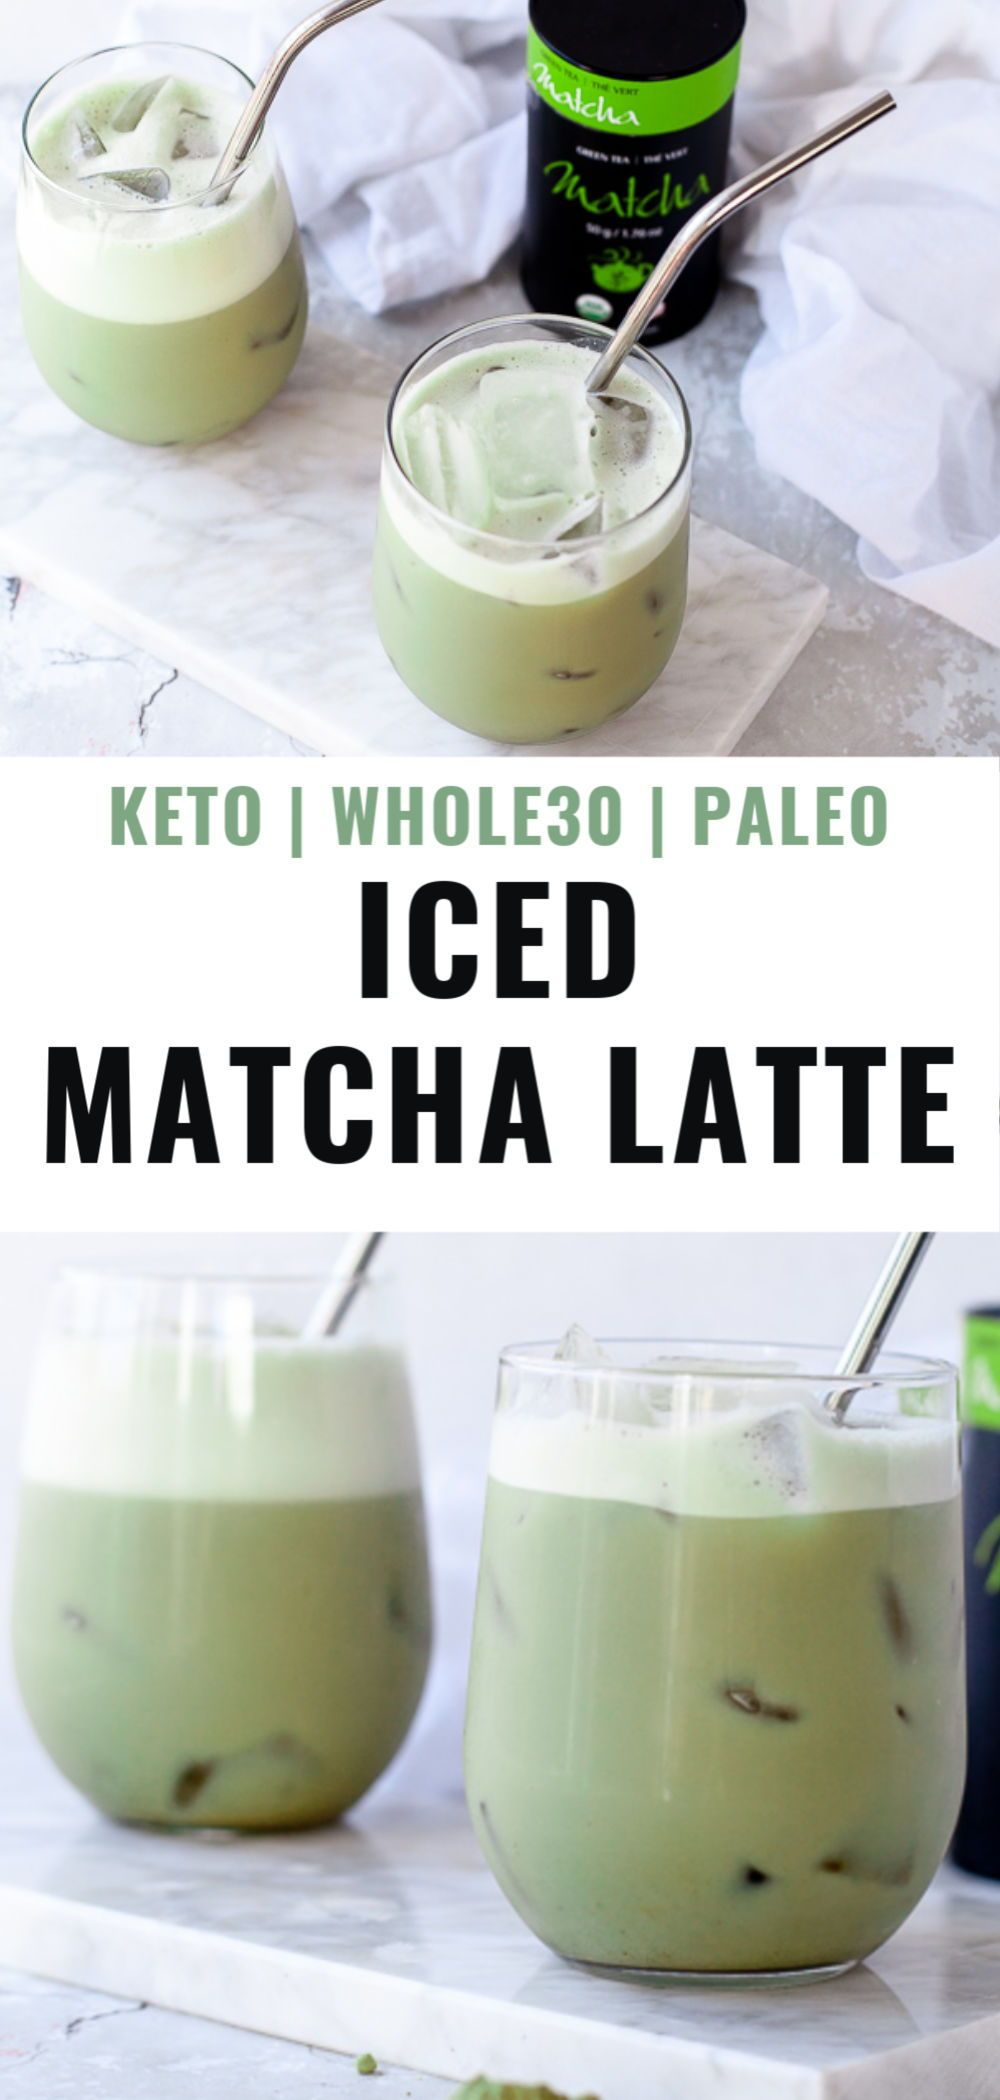 Iced Matcha Latte (keto, whole30, paleo) Recipe in 2020